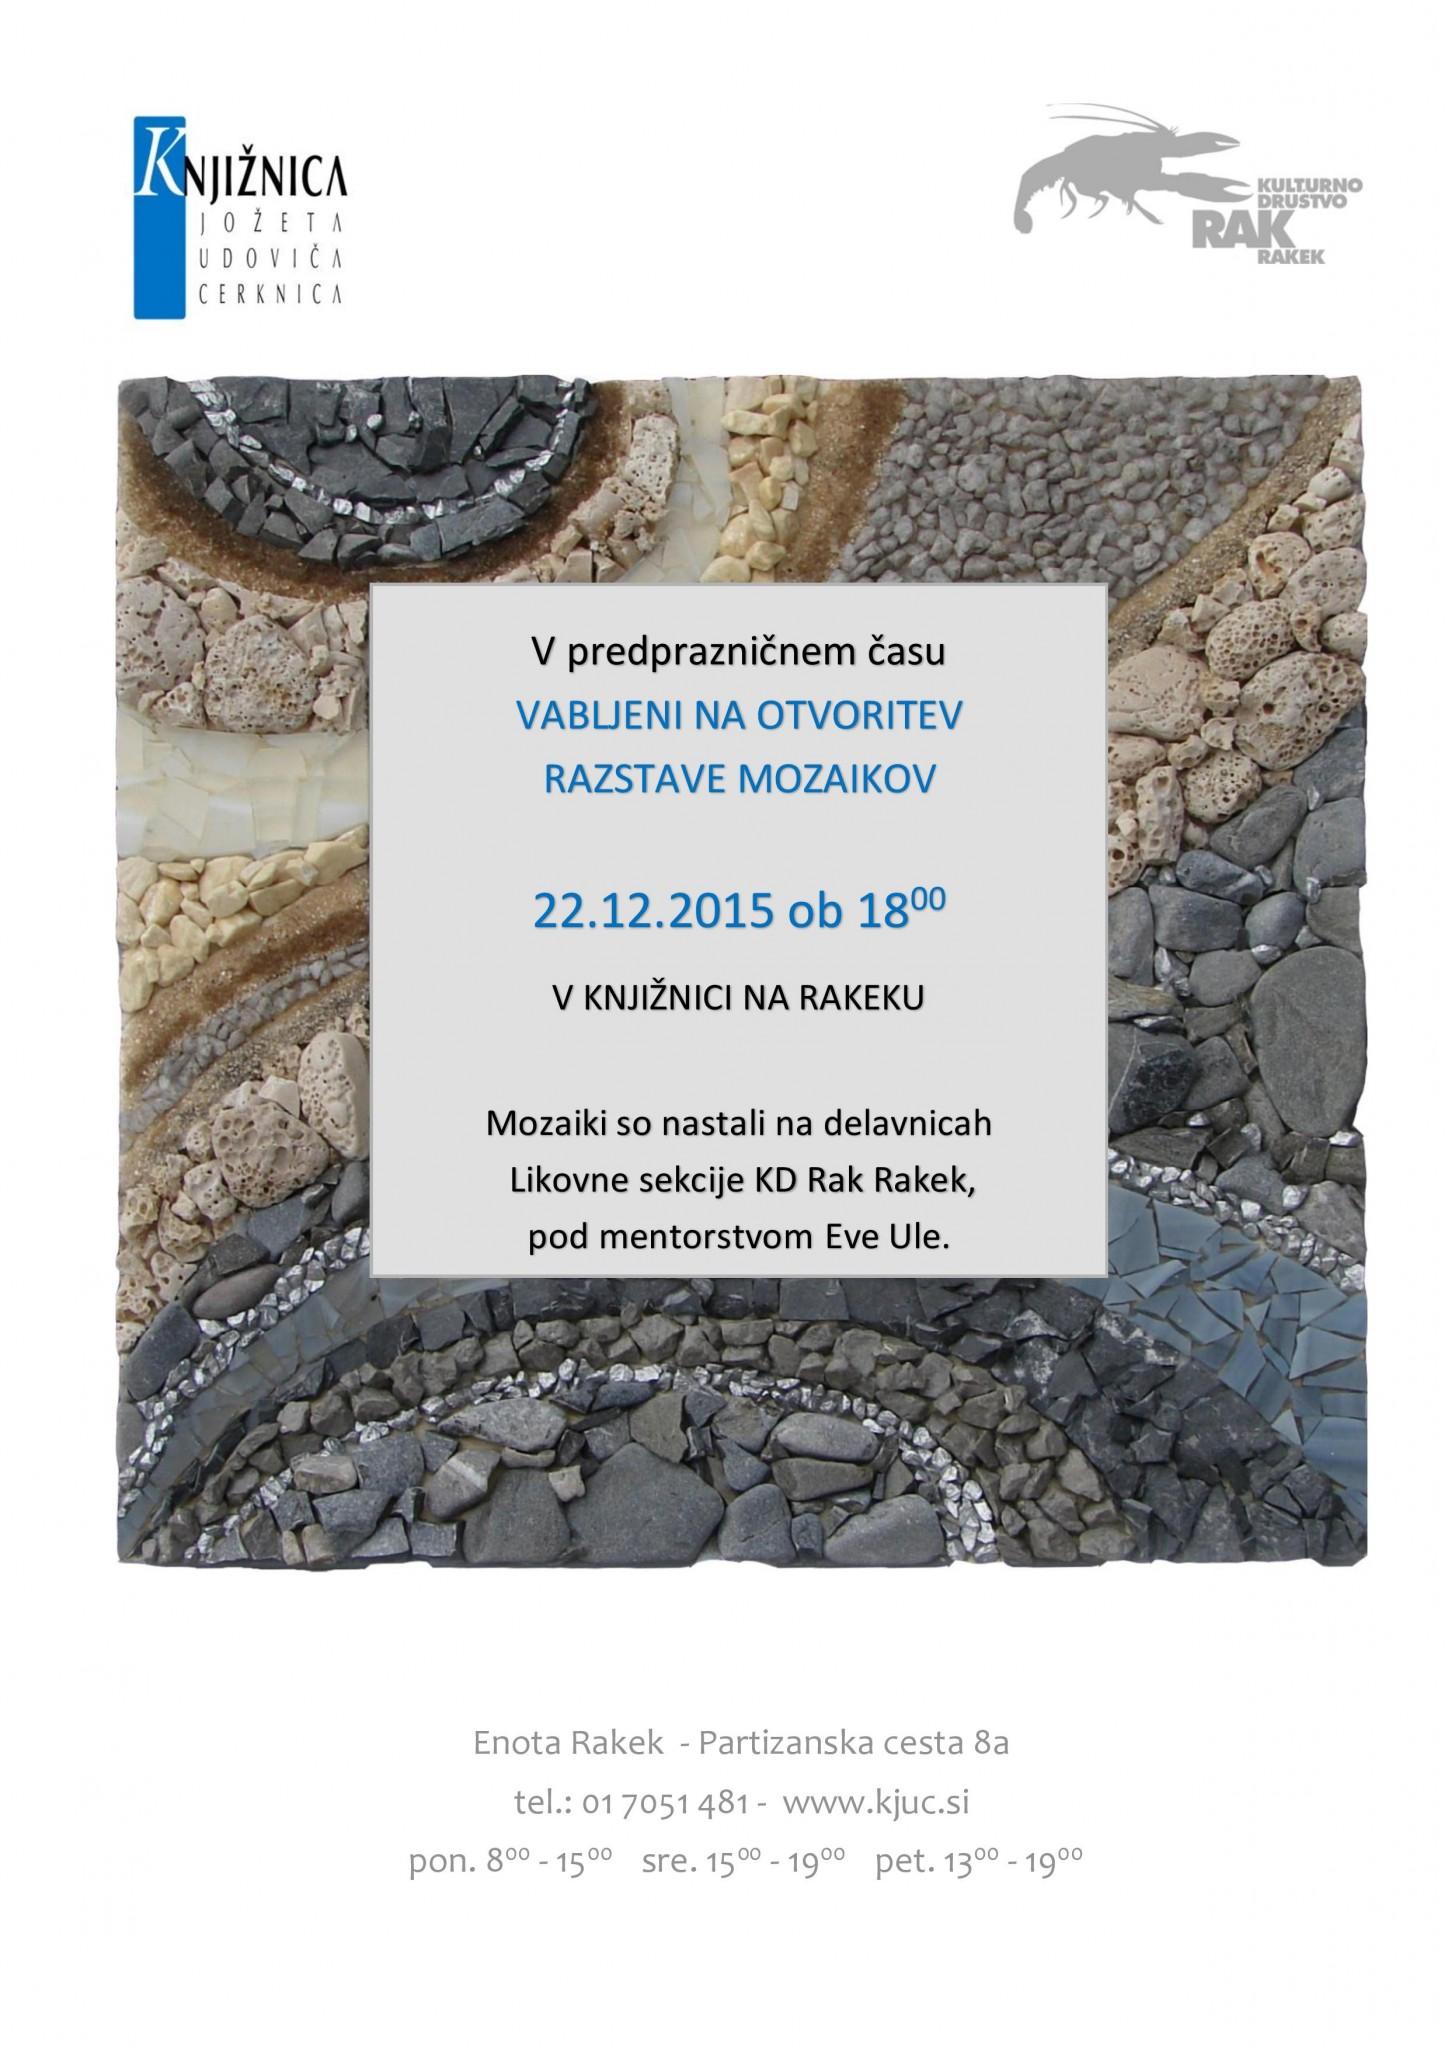 vabilo page 001 - Razstava mozaikov